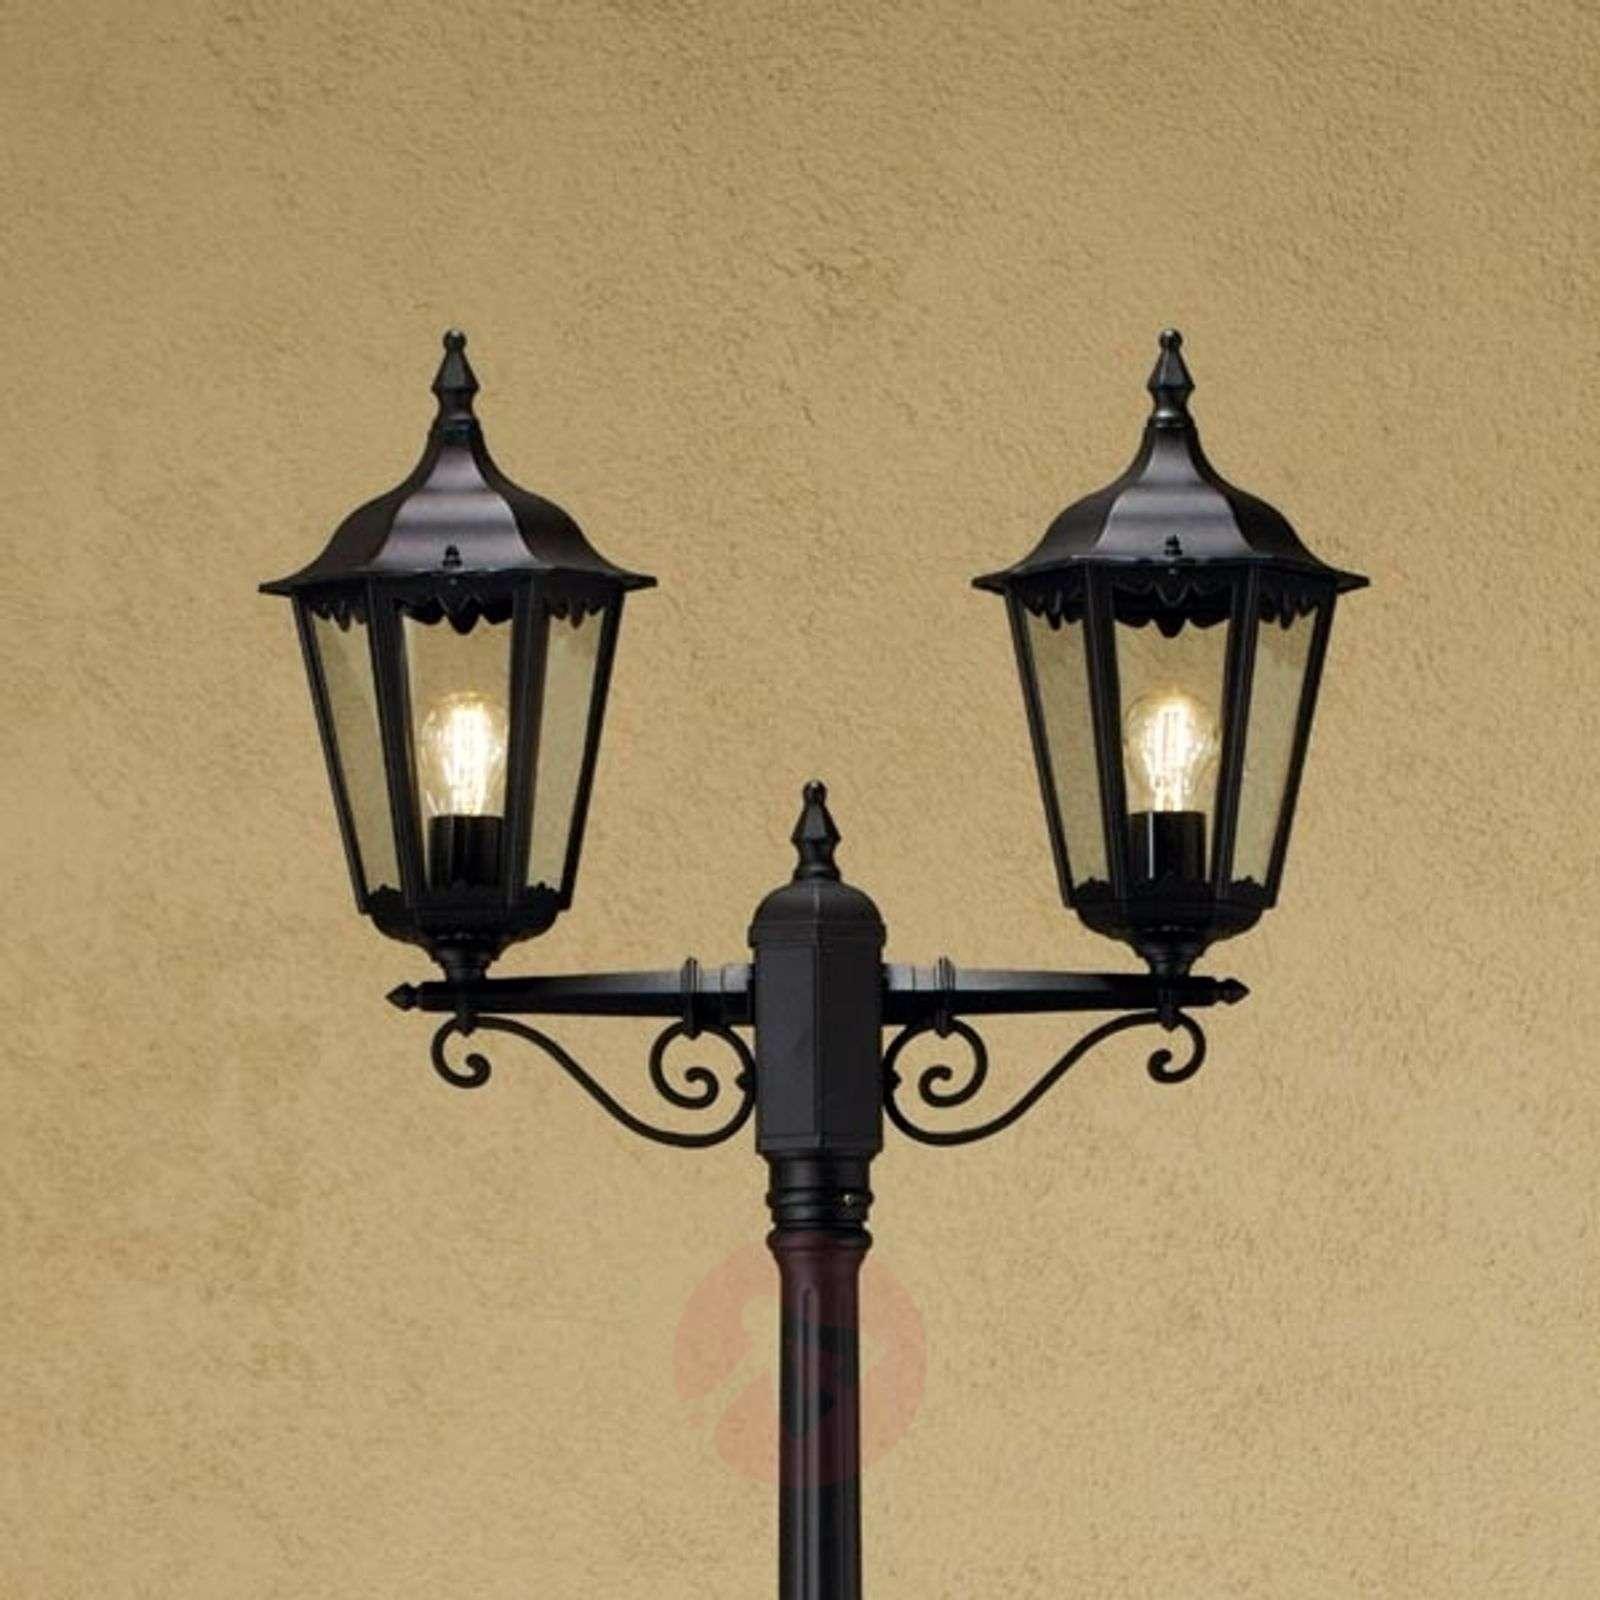 Kaksilamppuinen lyhtypylväs Firenze-5522193X-01